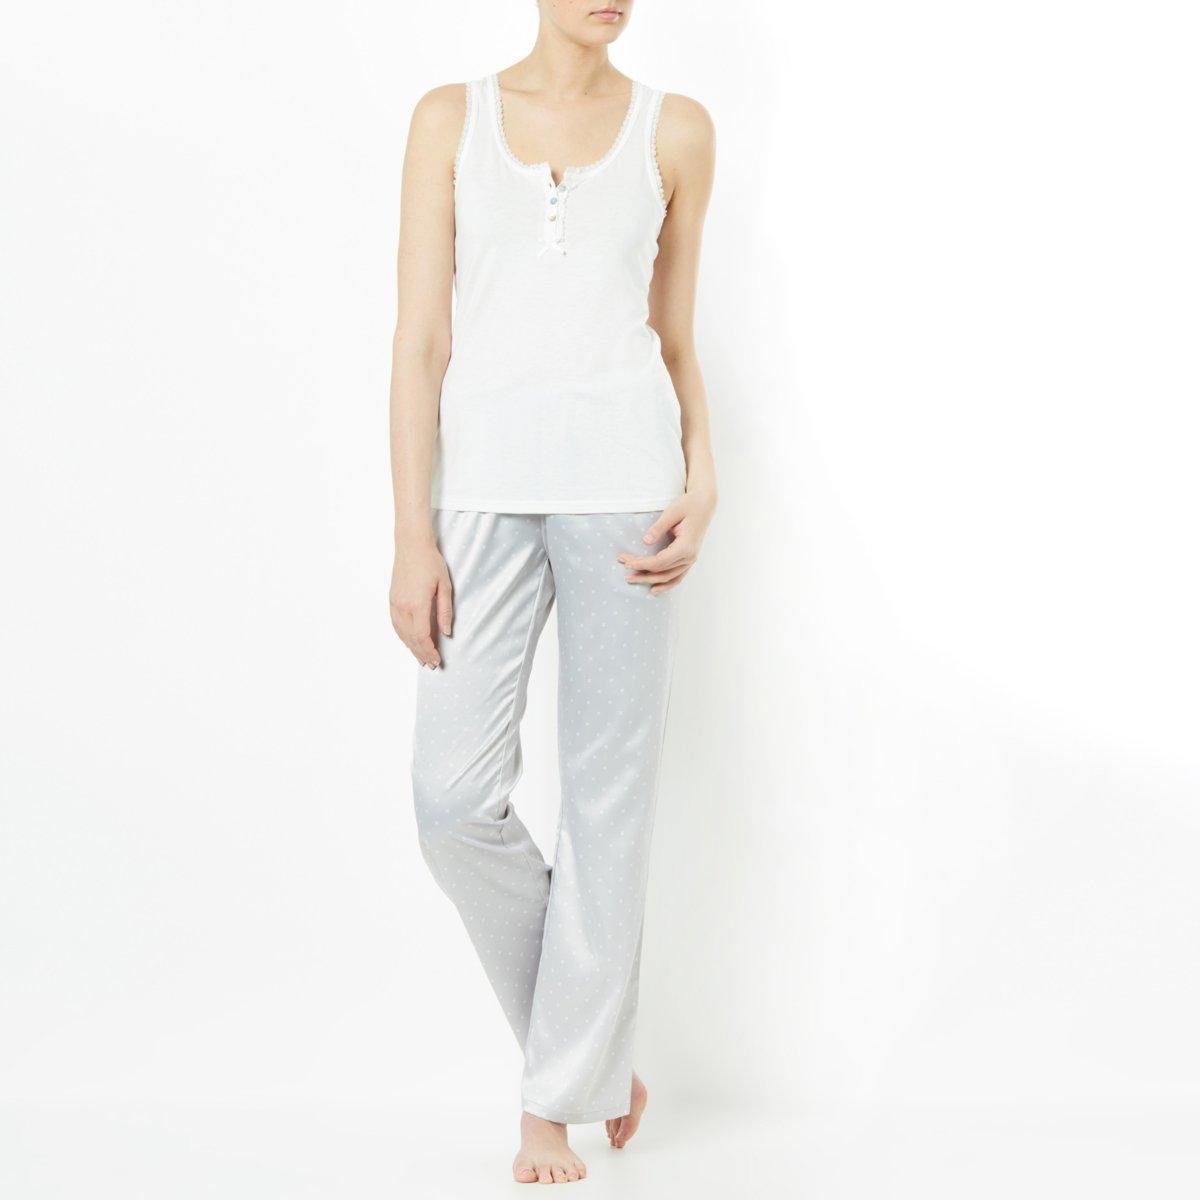 Пижама с атласными брюками от La Redoute